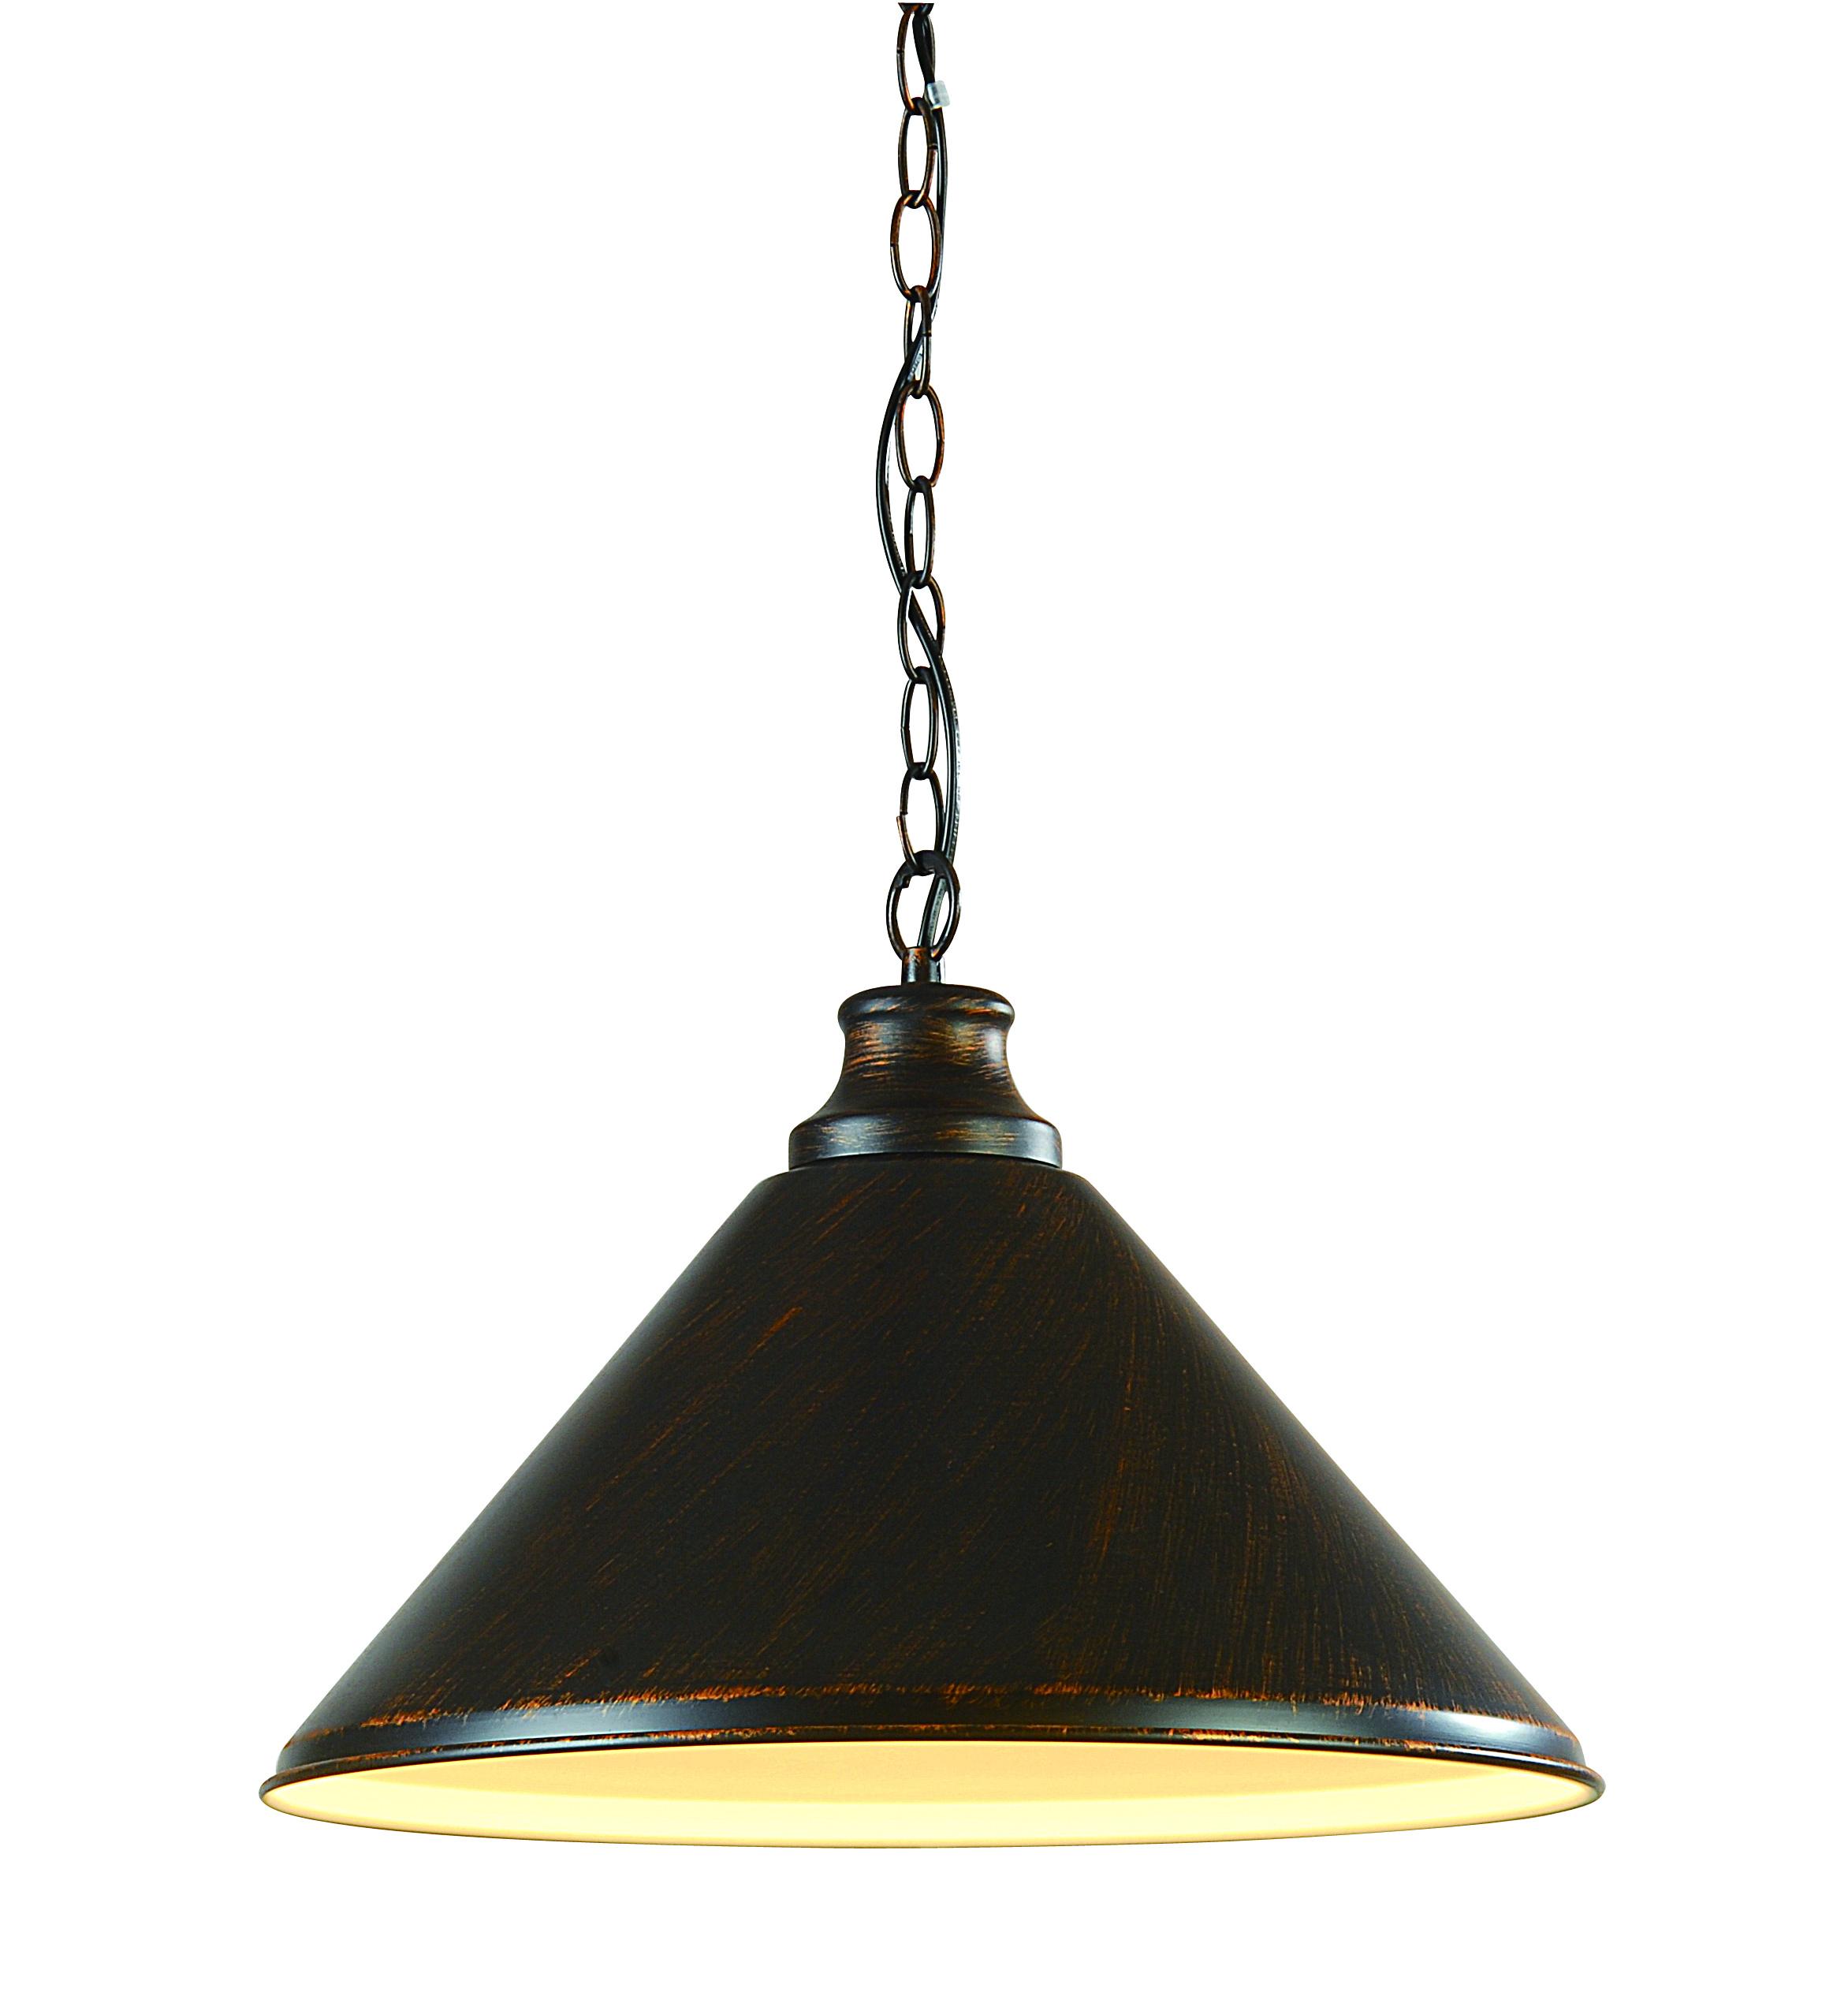 Светильник подвесной Arte lamp Cone a9330sp-1br arte lamp бра cone a9330ap 1br